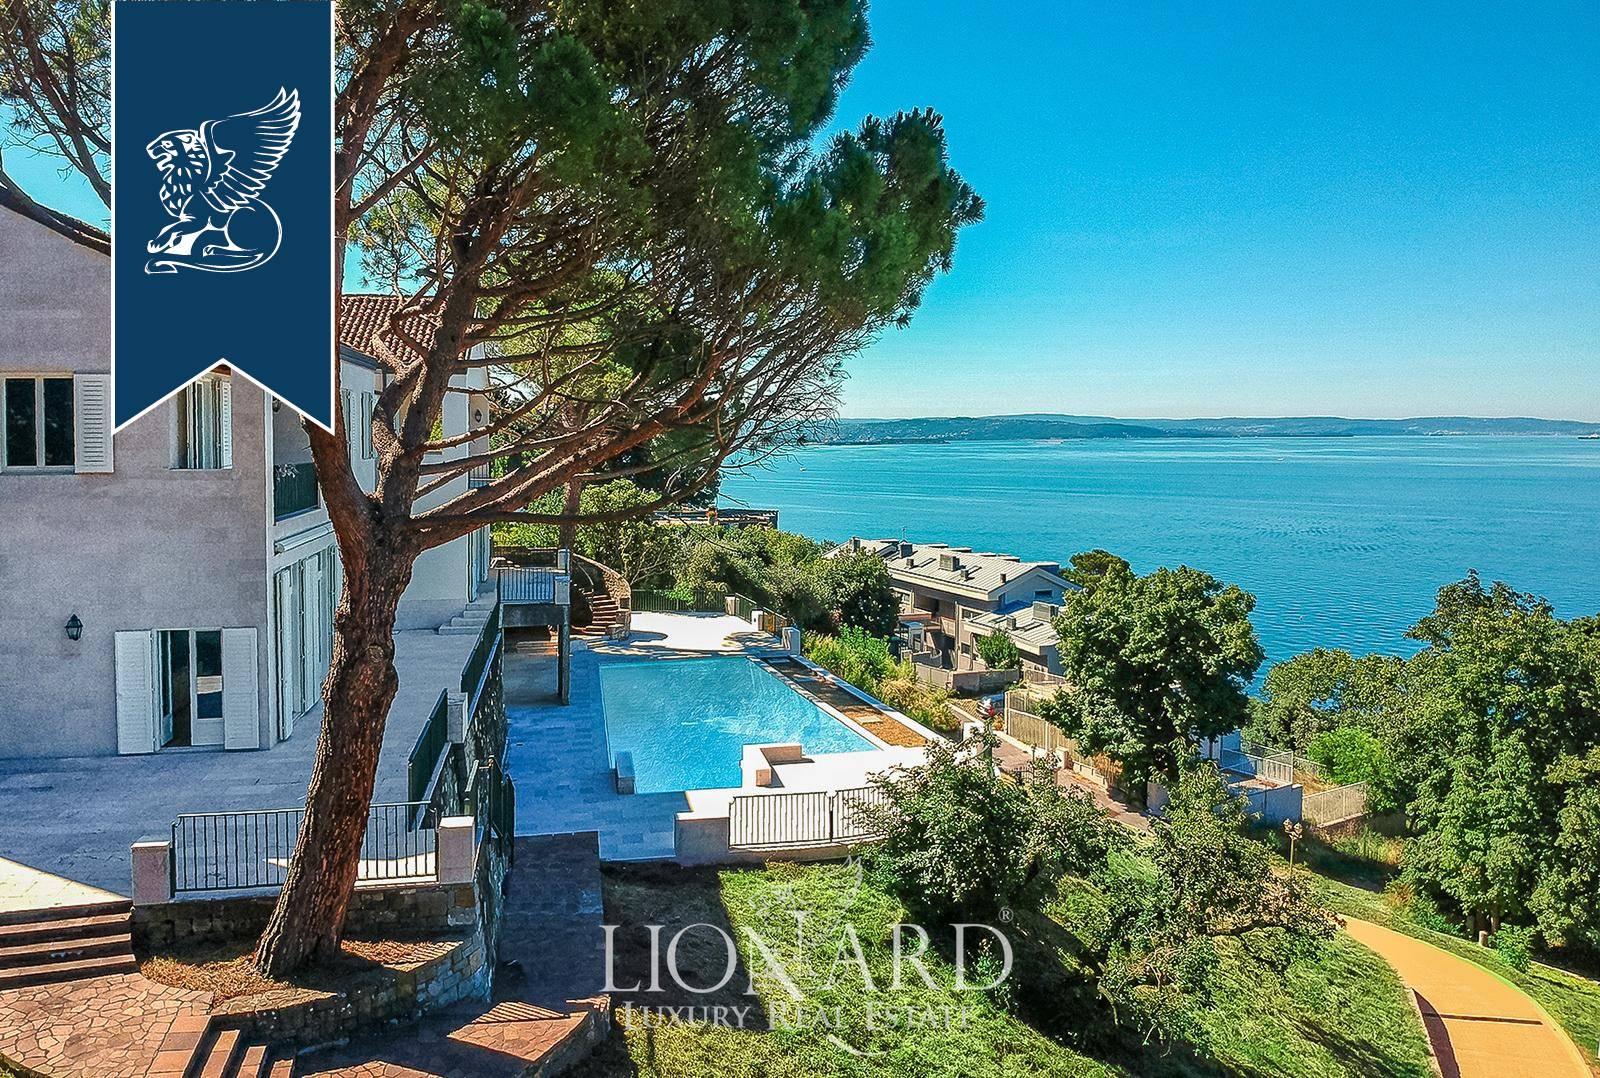 Villa in Vendita a Trieste: 0 locali, 900 mq - Foto 7